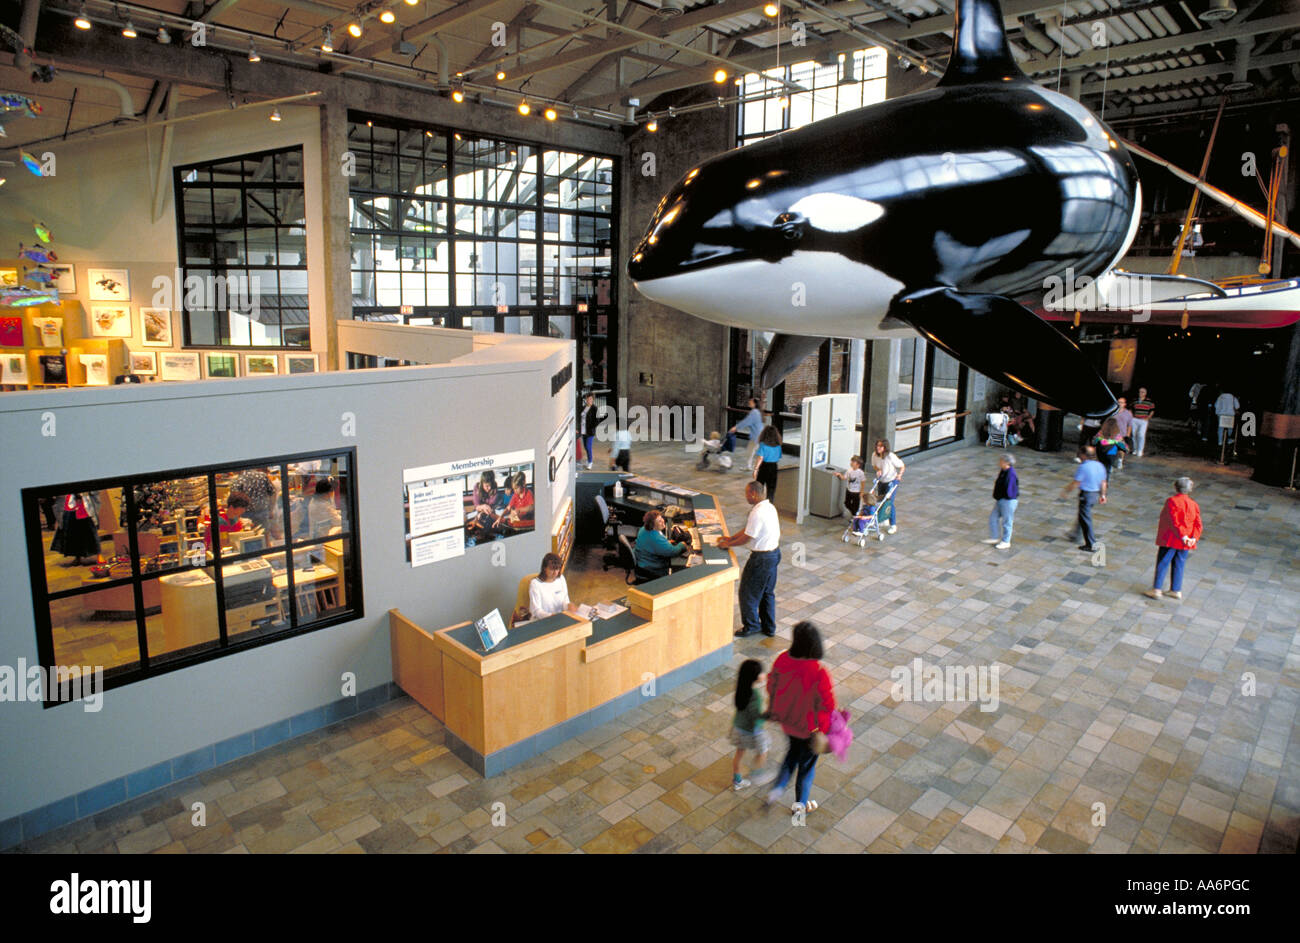 Elk237 1317 California Monterey Monterey Bay Aquarium lobby - Stock Image